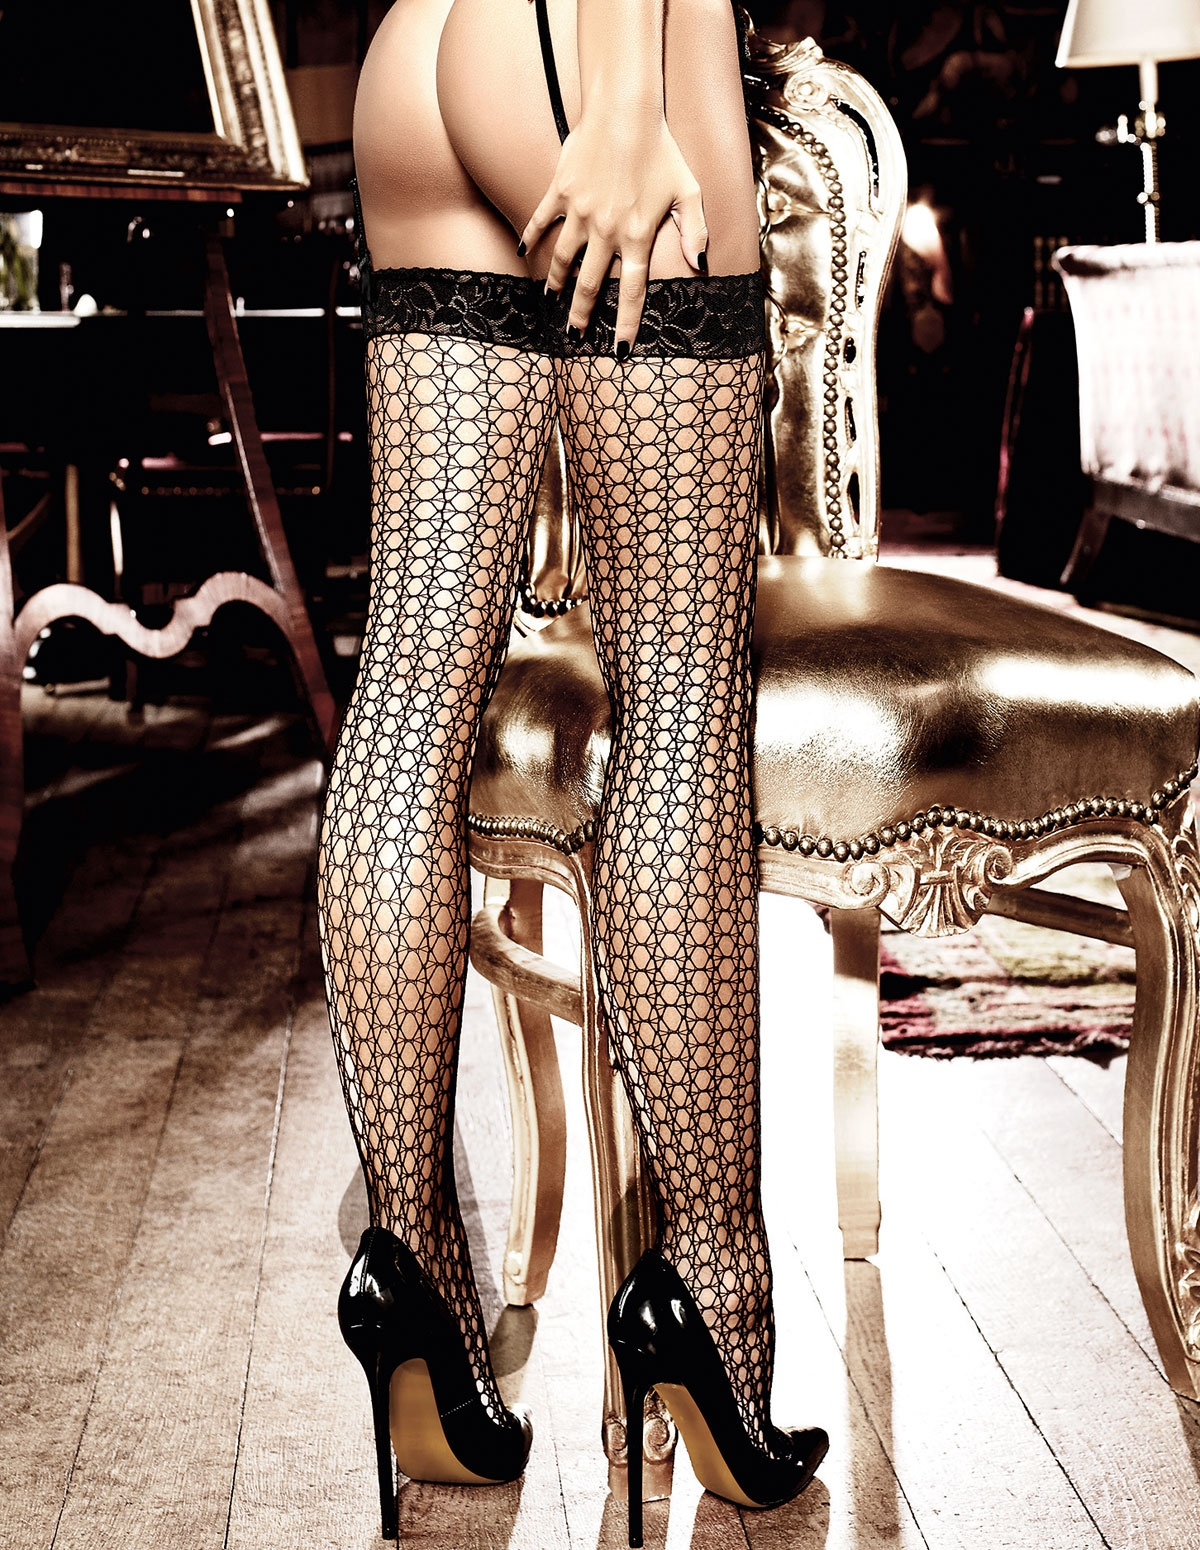 L/T Crochet Stockings